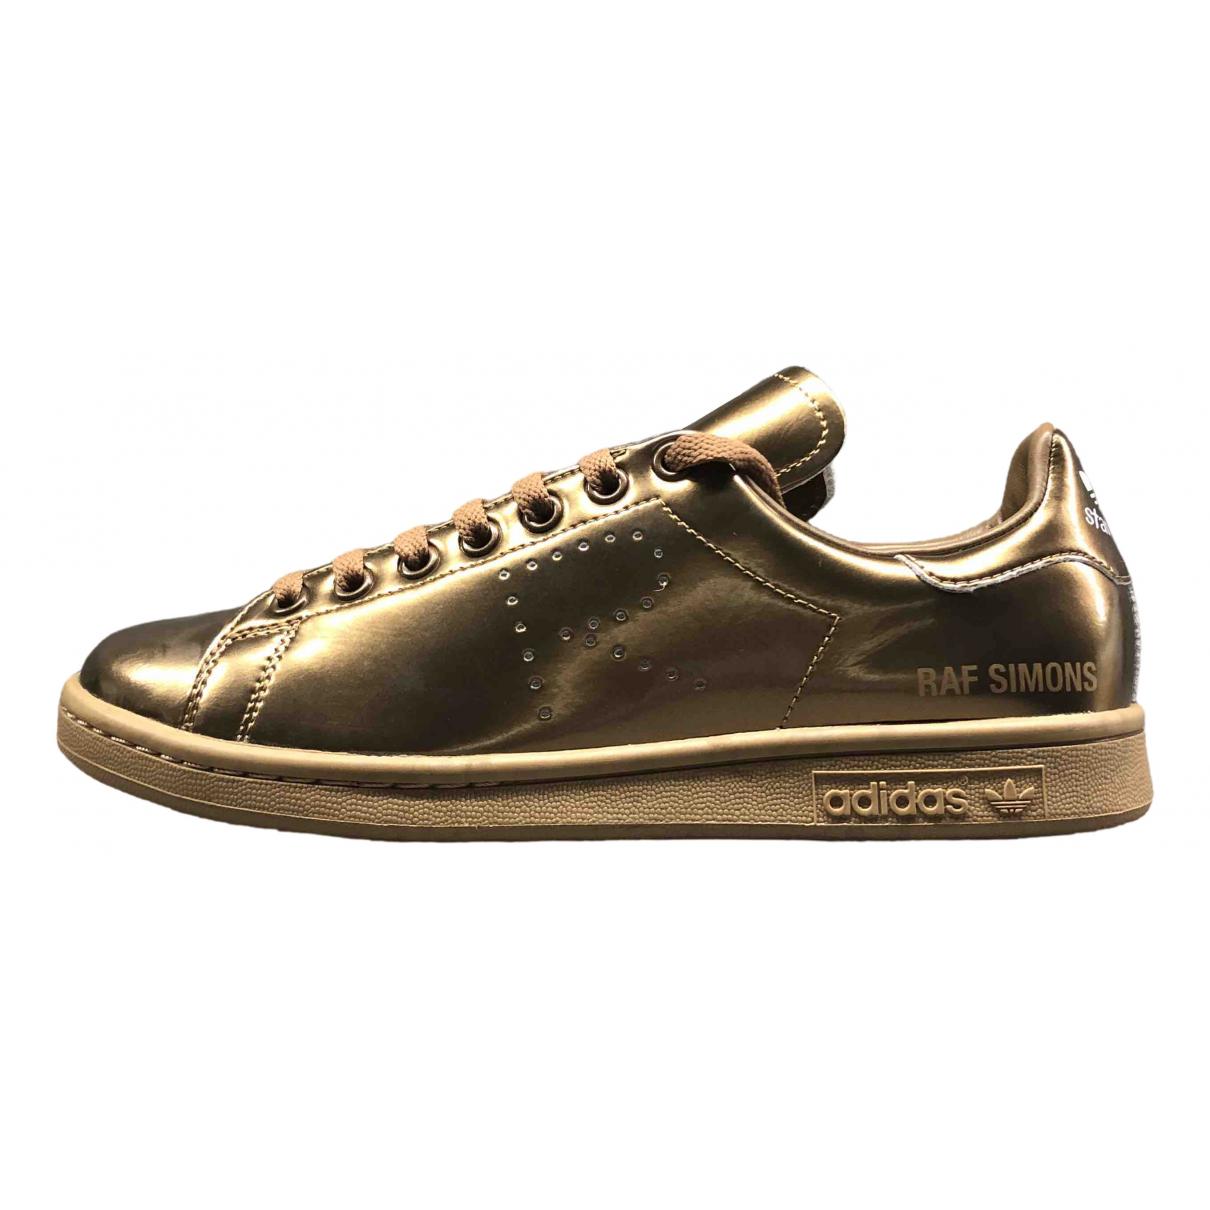 Adidas X Raf Simons Stan Smith Leather Trainers for Men 40.5 EU